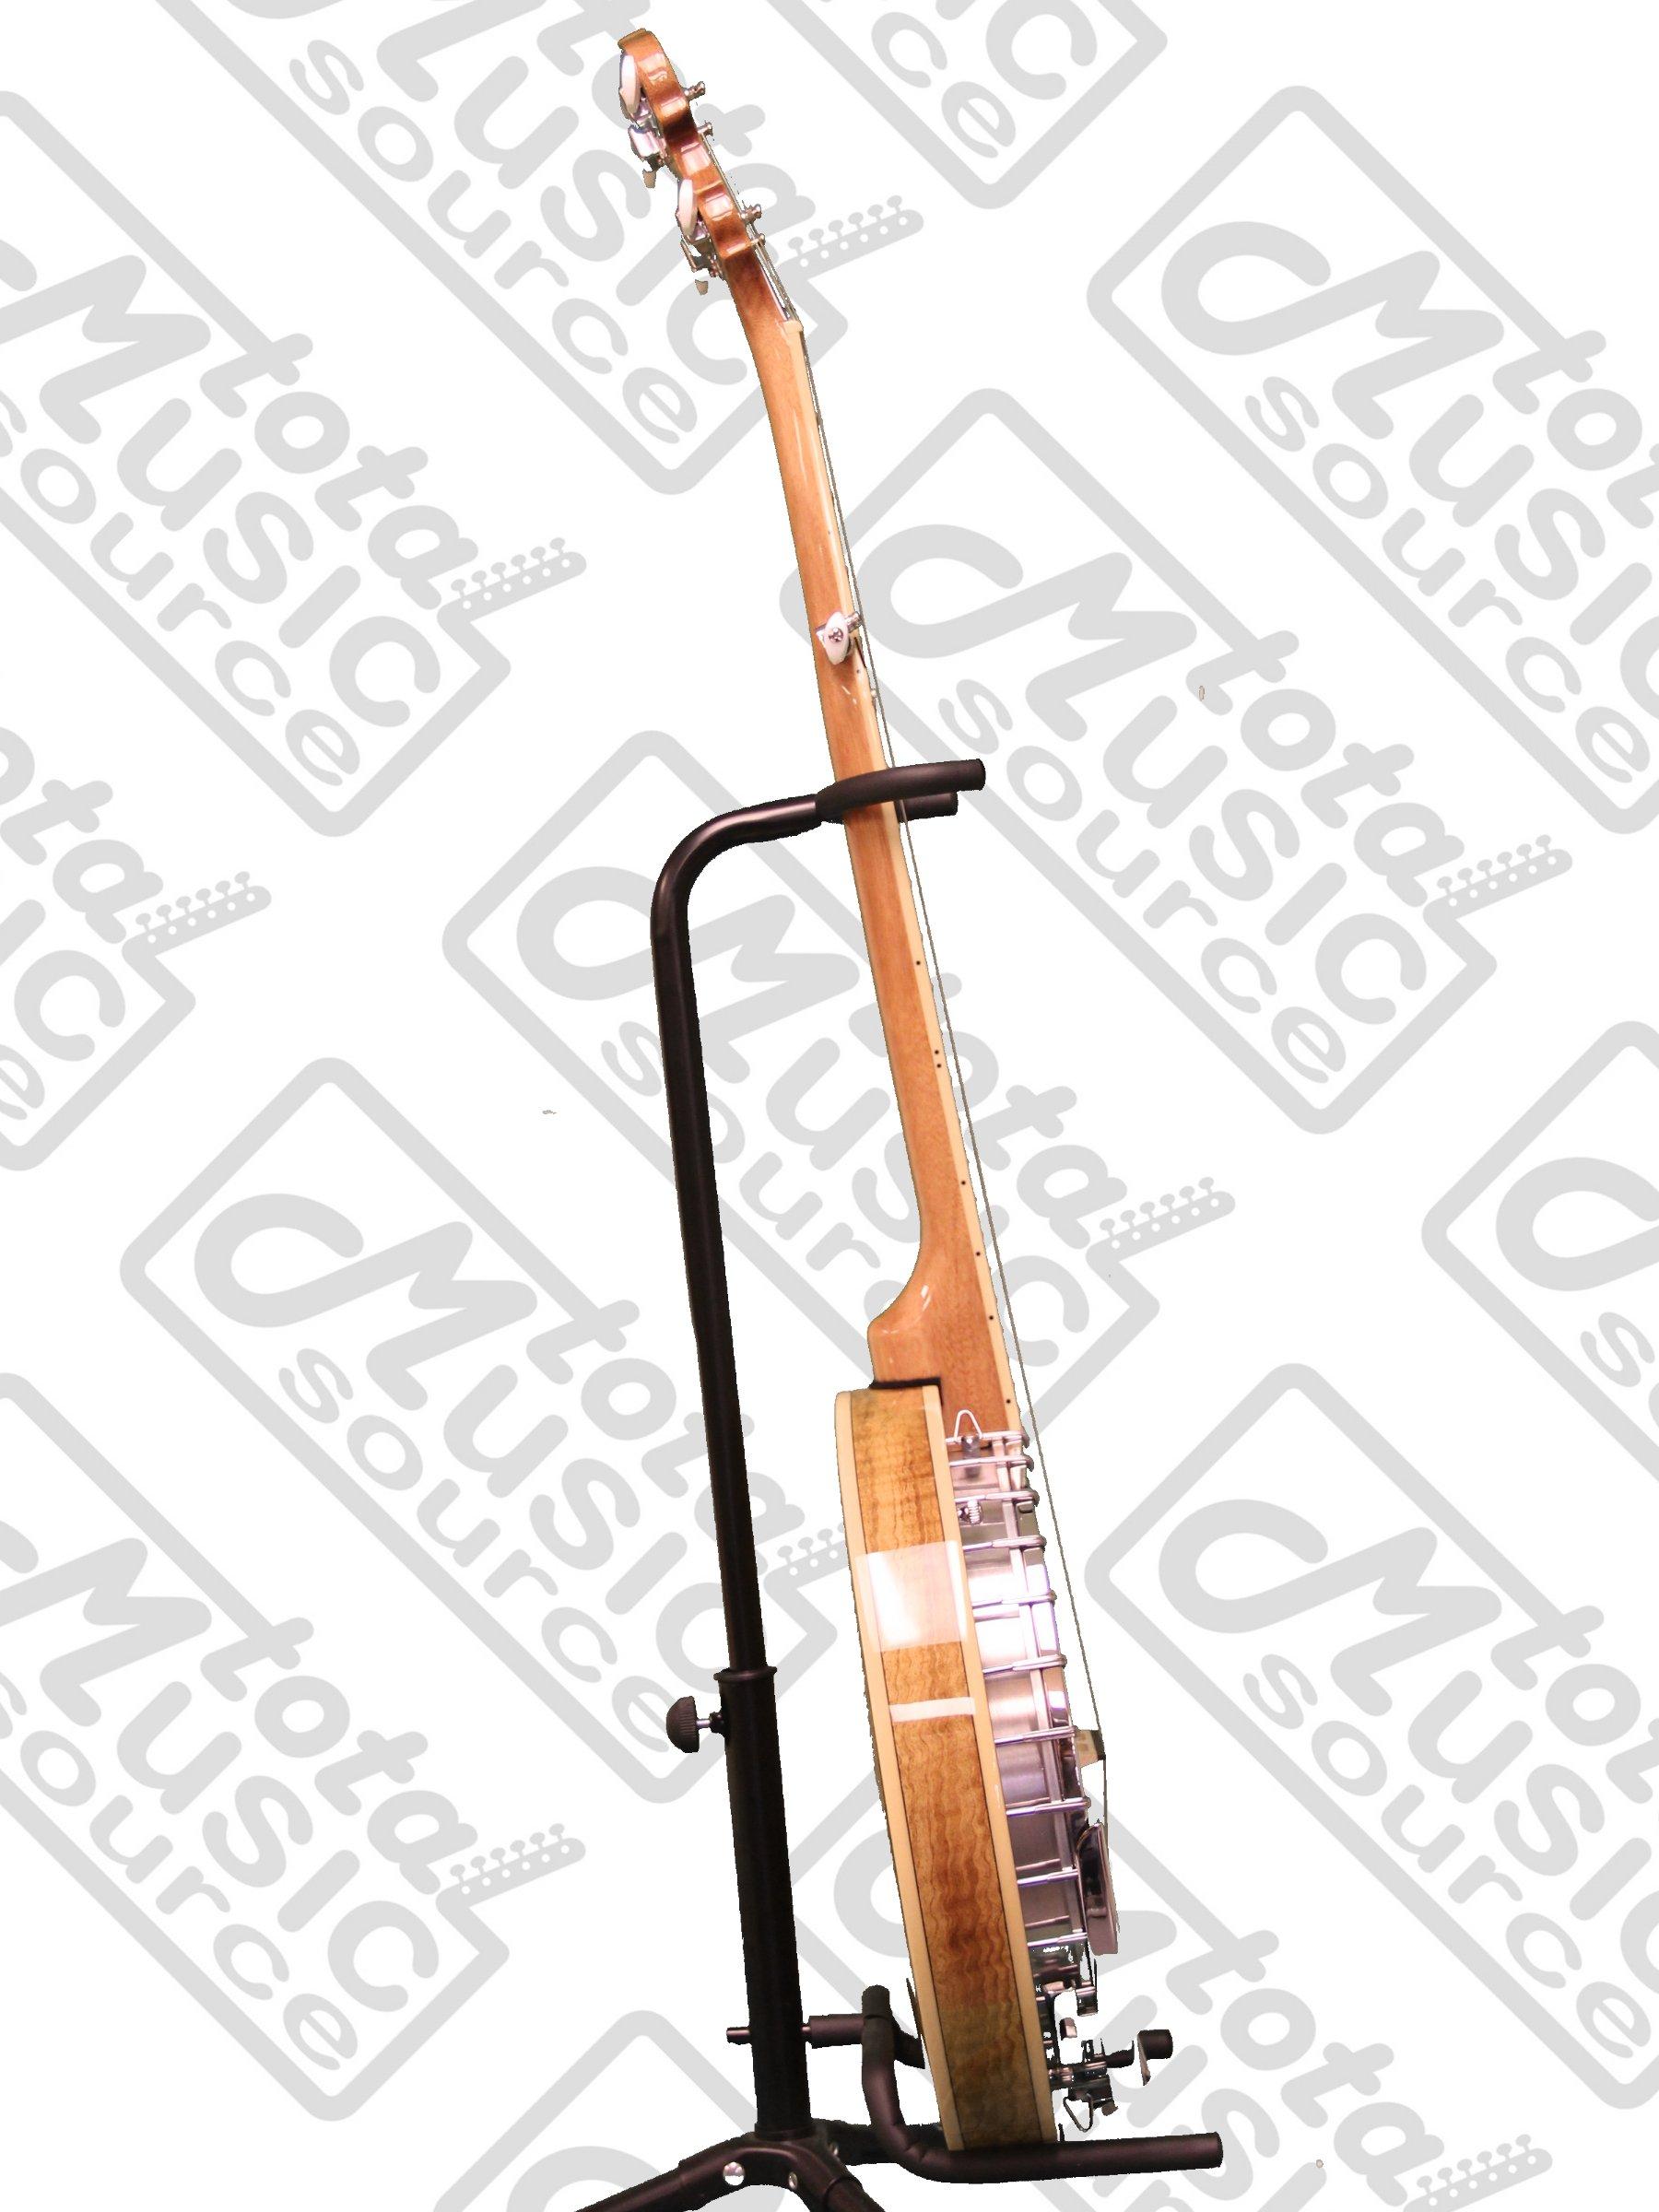 Oscar Schmidt OB5SP 5-String Banjo, Remo Head,Spalted Maple Resonator, Gloss Finish by Oscar Schmidt (Image #5)